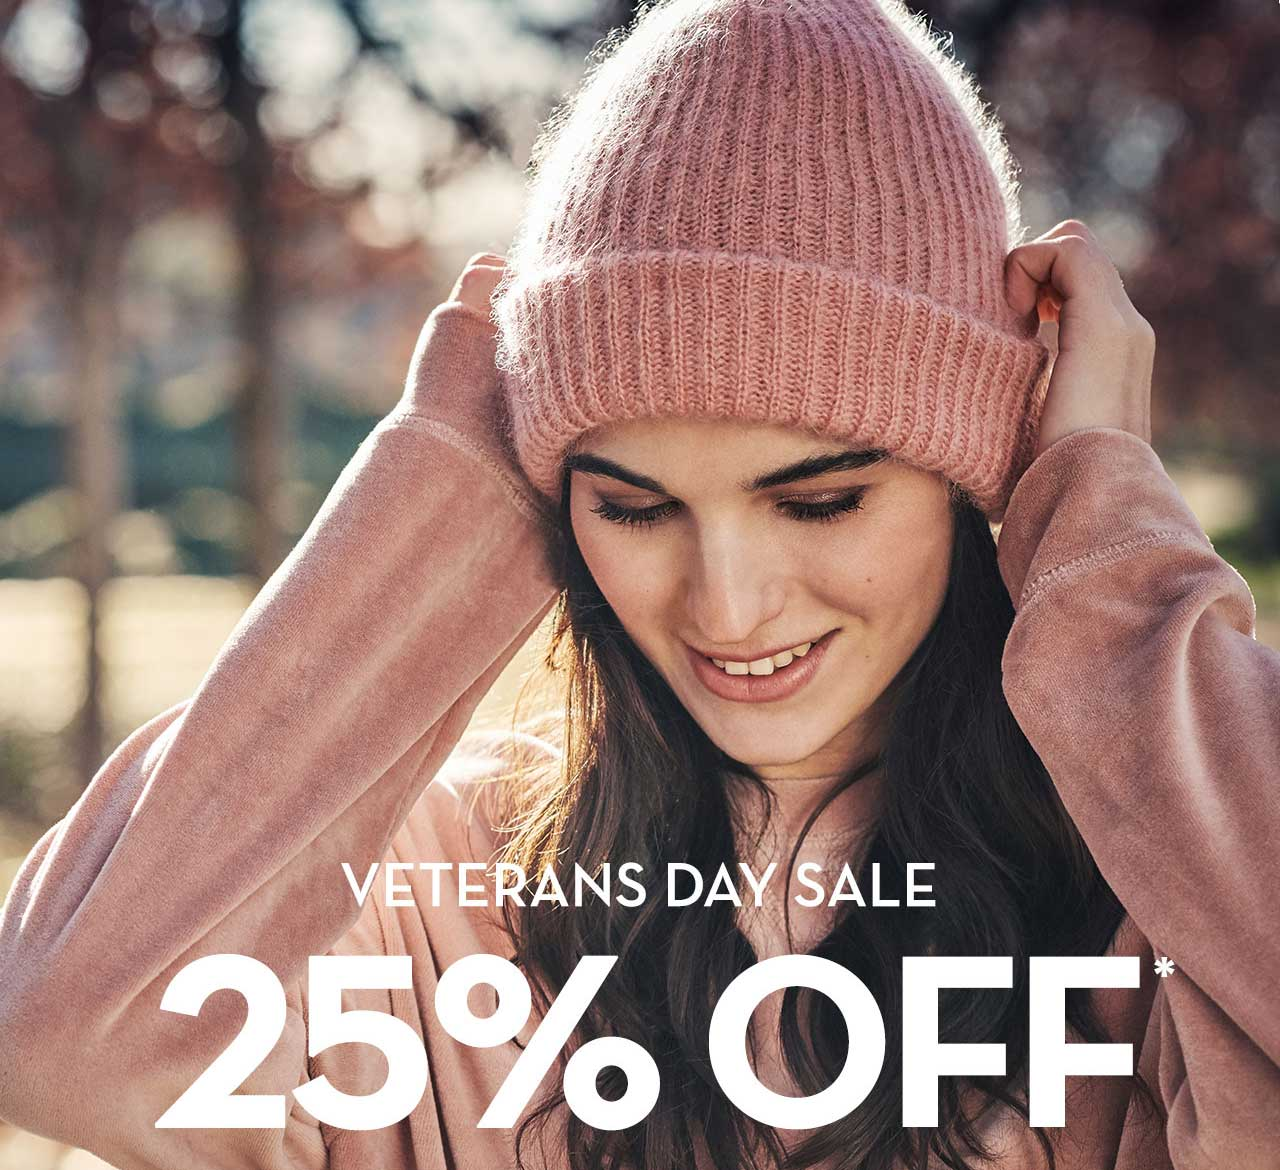 Veteran's Day Sale 25% Off